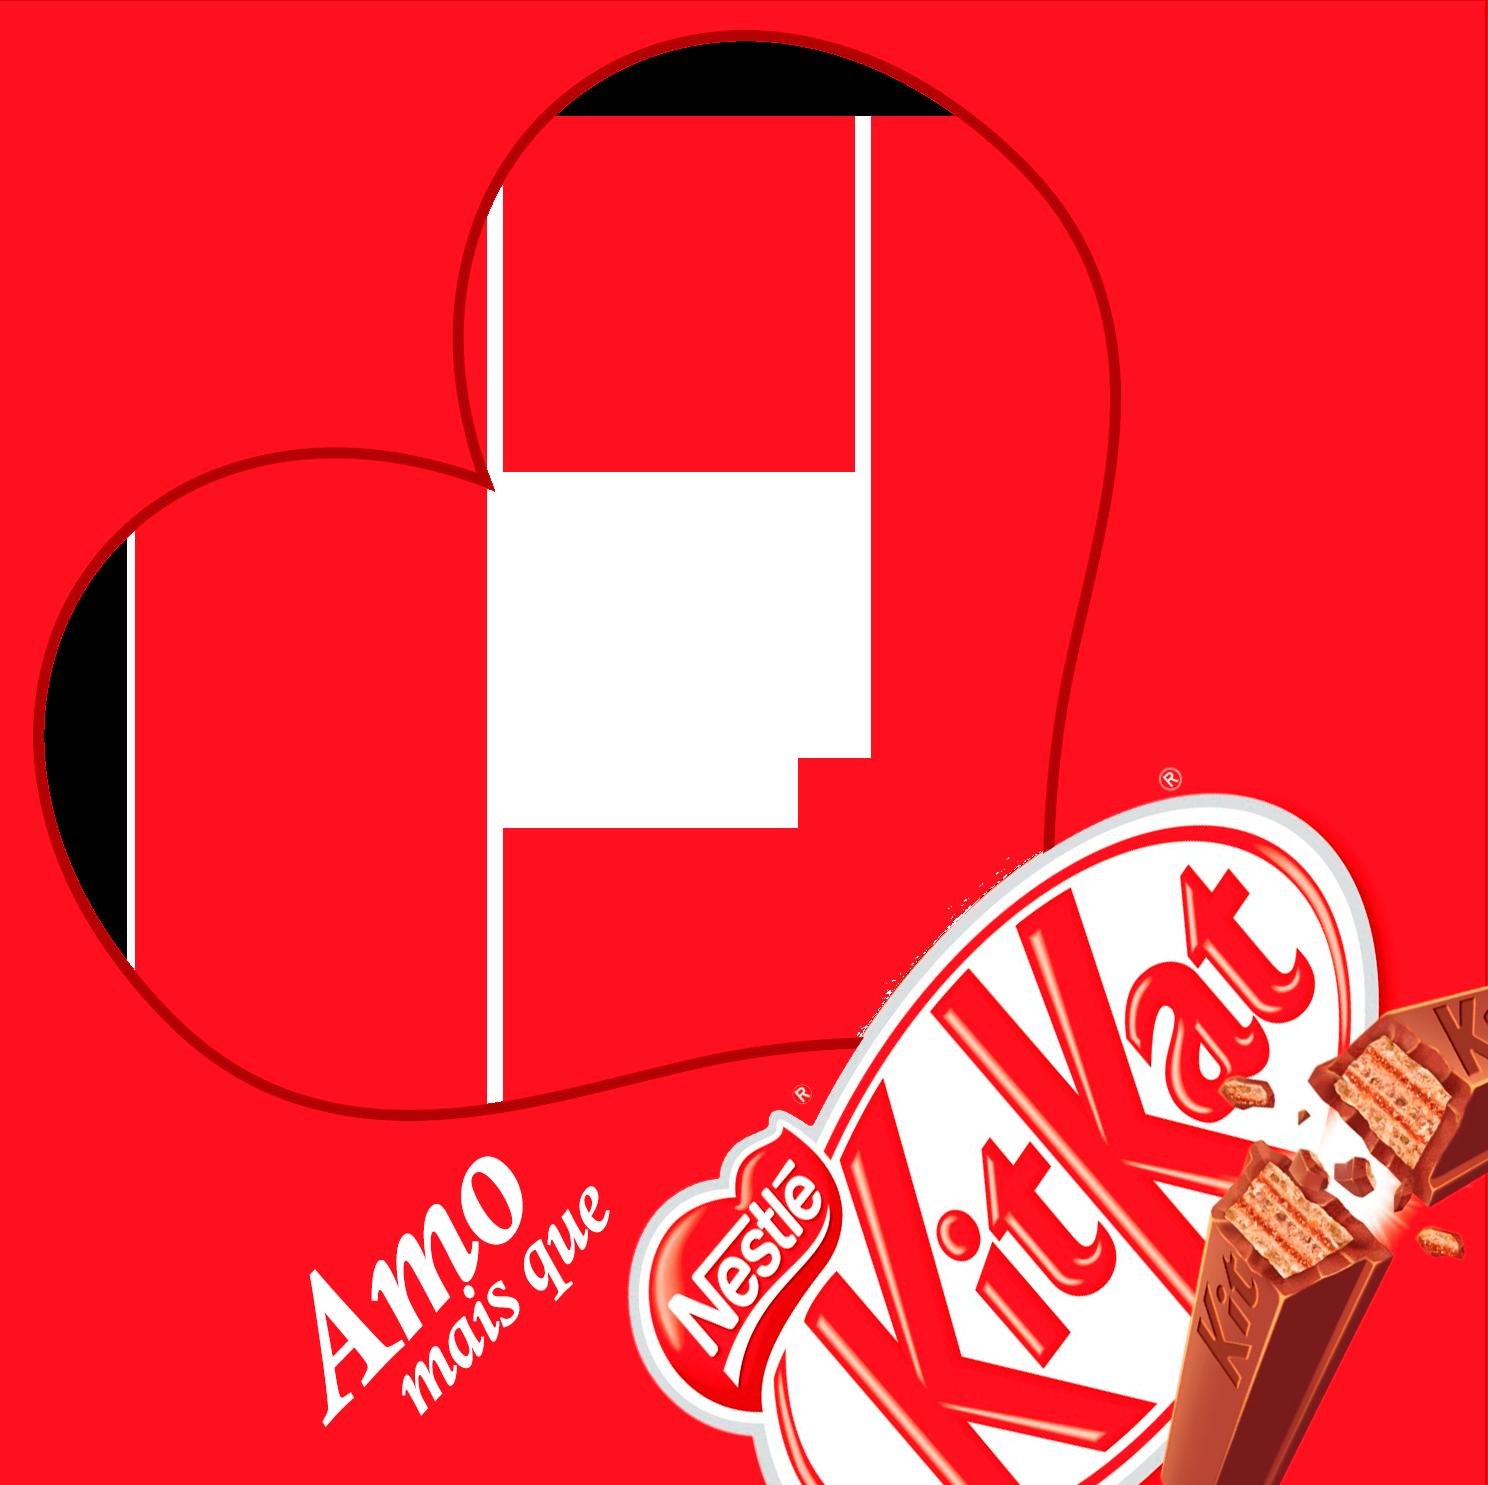 Adesivo para Caixa de Bombom Dia dos Namorados Kit Kat